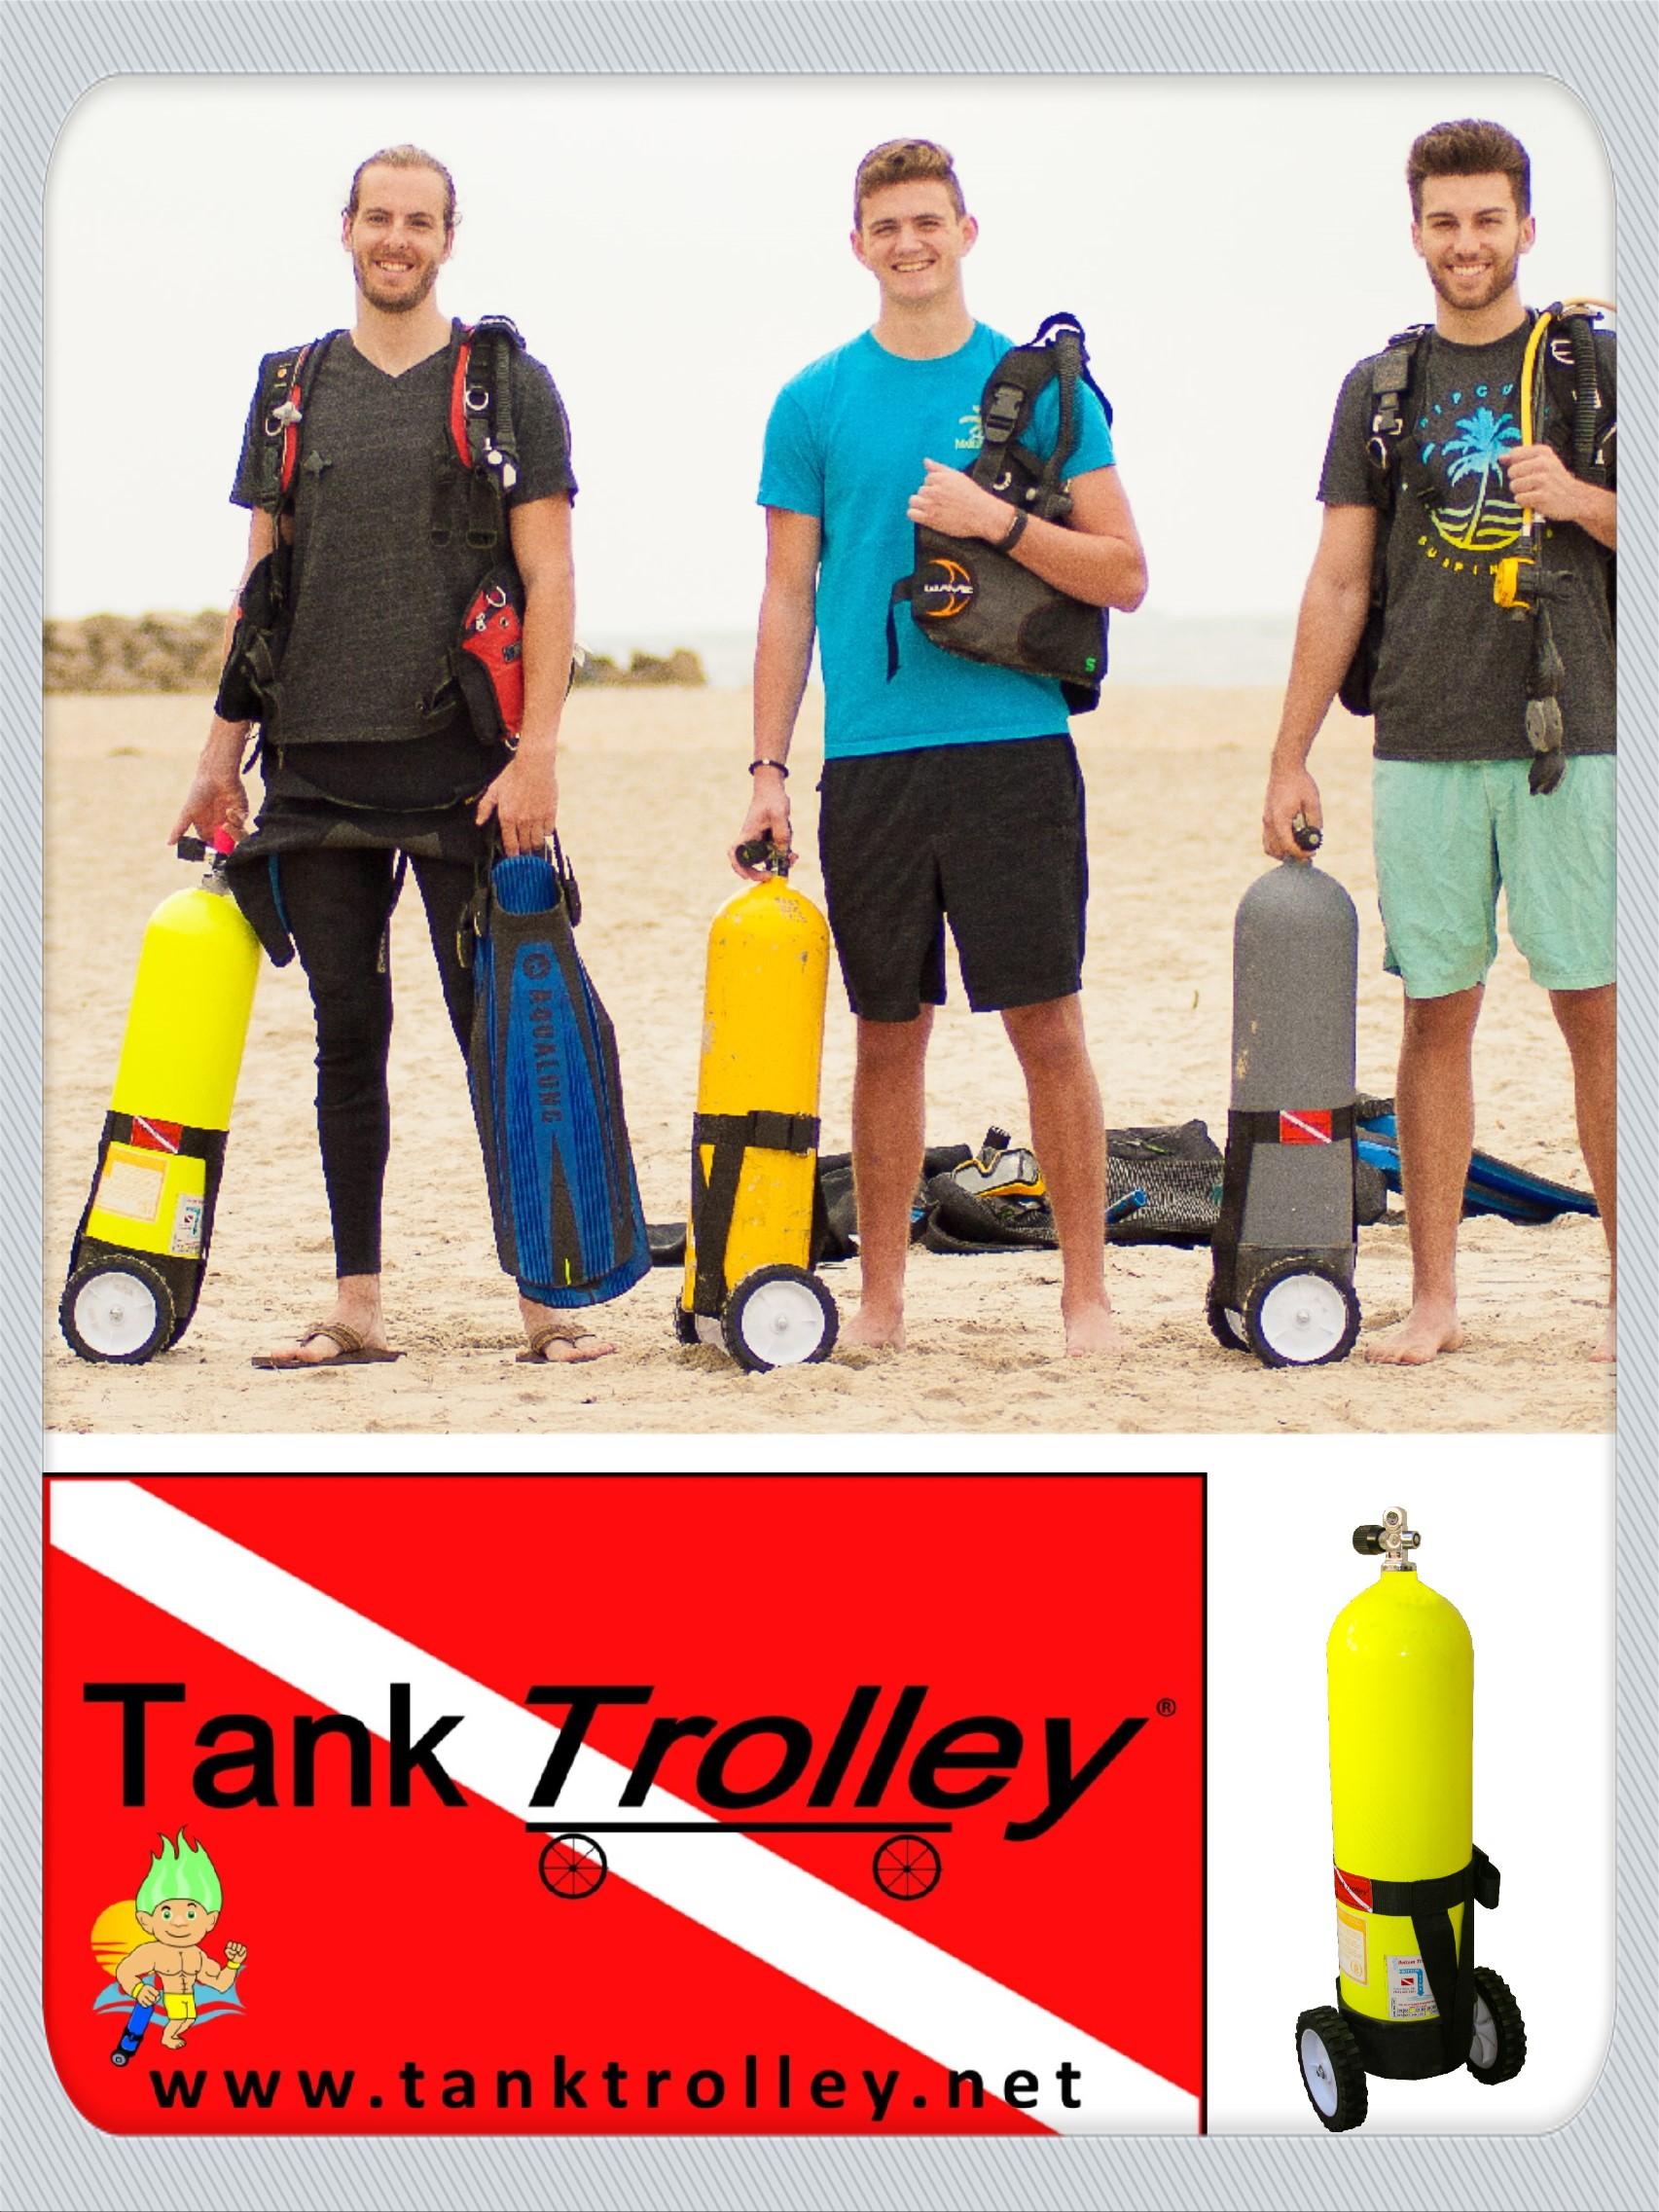 visit us at www.tanktrolley.net